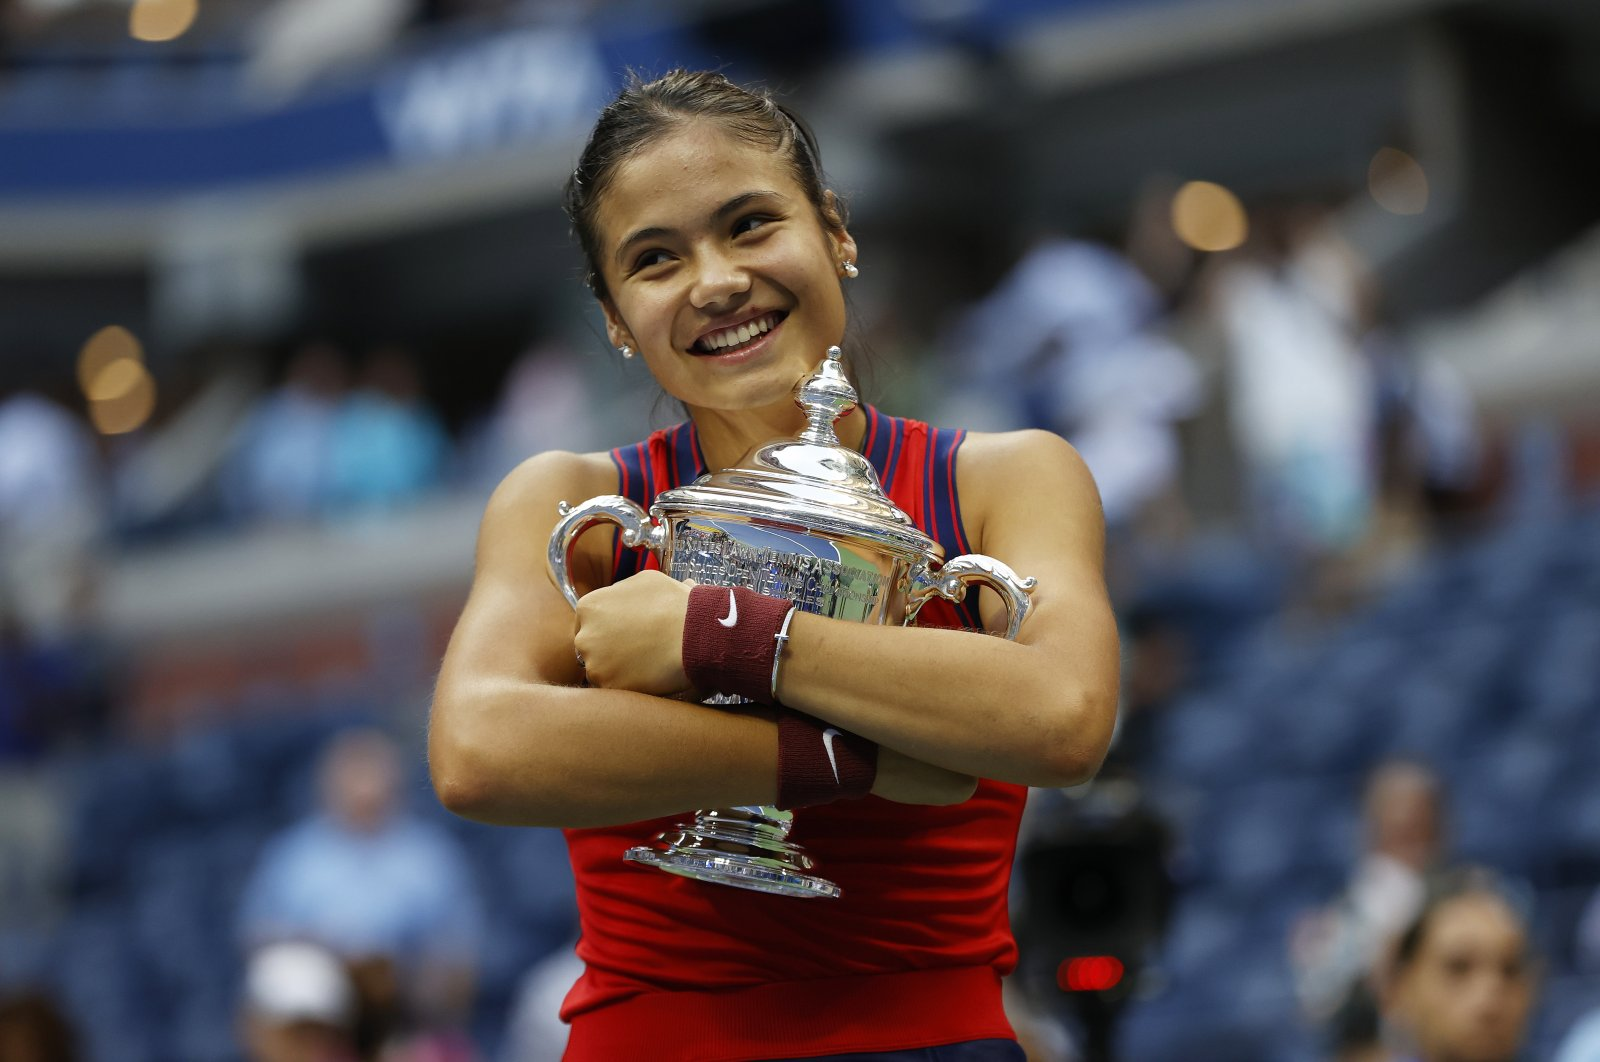 Britain's Emma Raducanu celebrates after winning the 2021 U.S. Open women's singles final, New York, U.S., Sept. 11, 2021. (AA Photo)